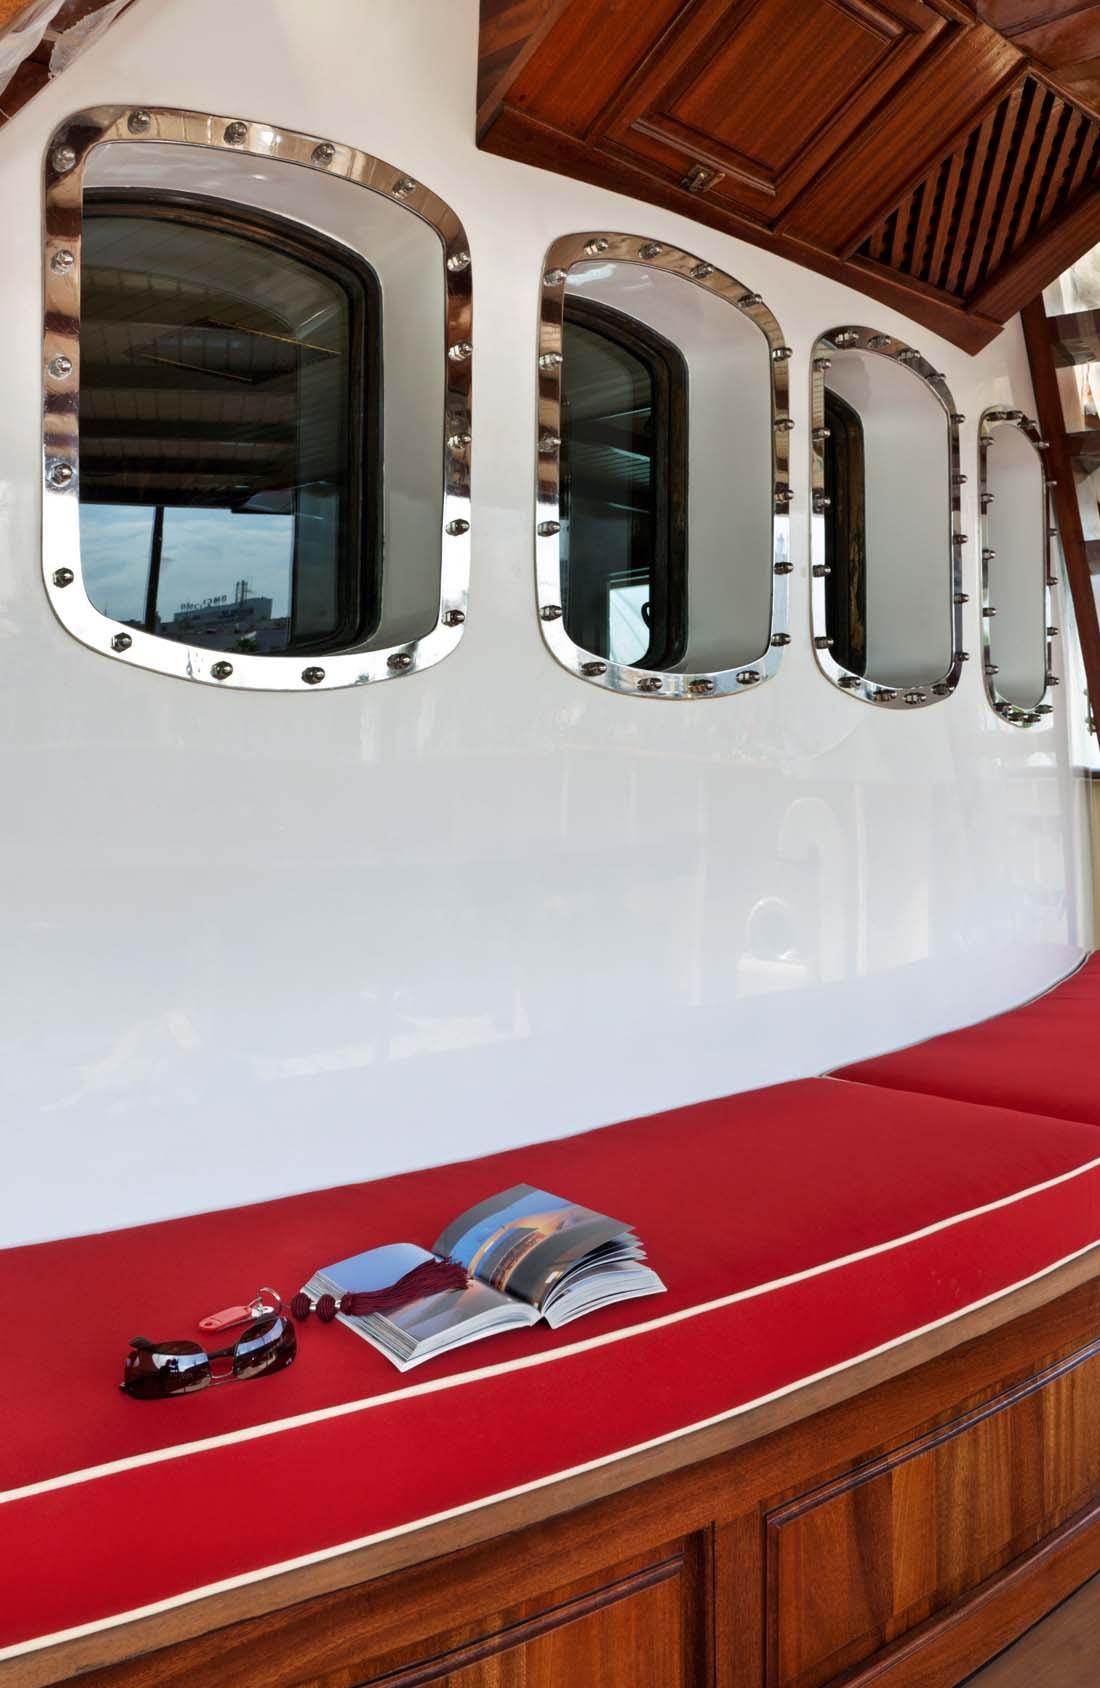 La Sultana, Spy Ship Turned Superyacht: Gallery - Megayacht News